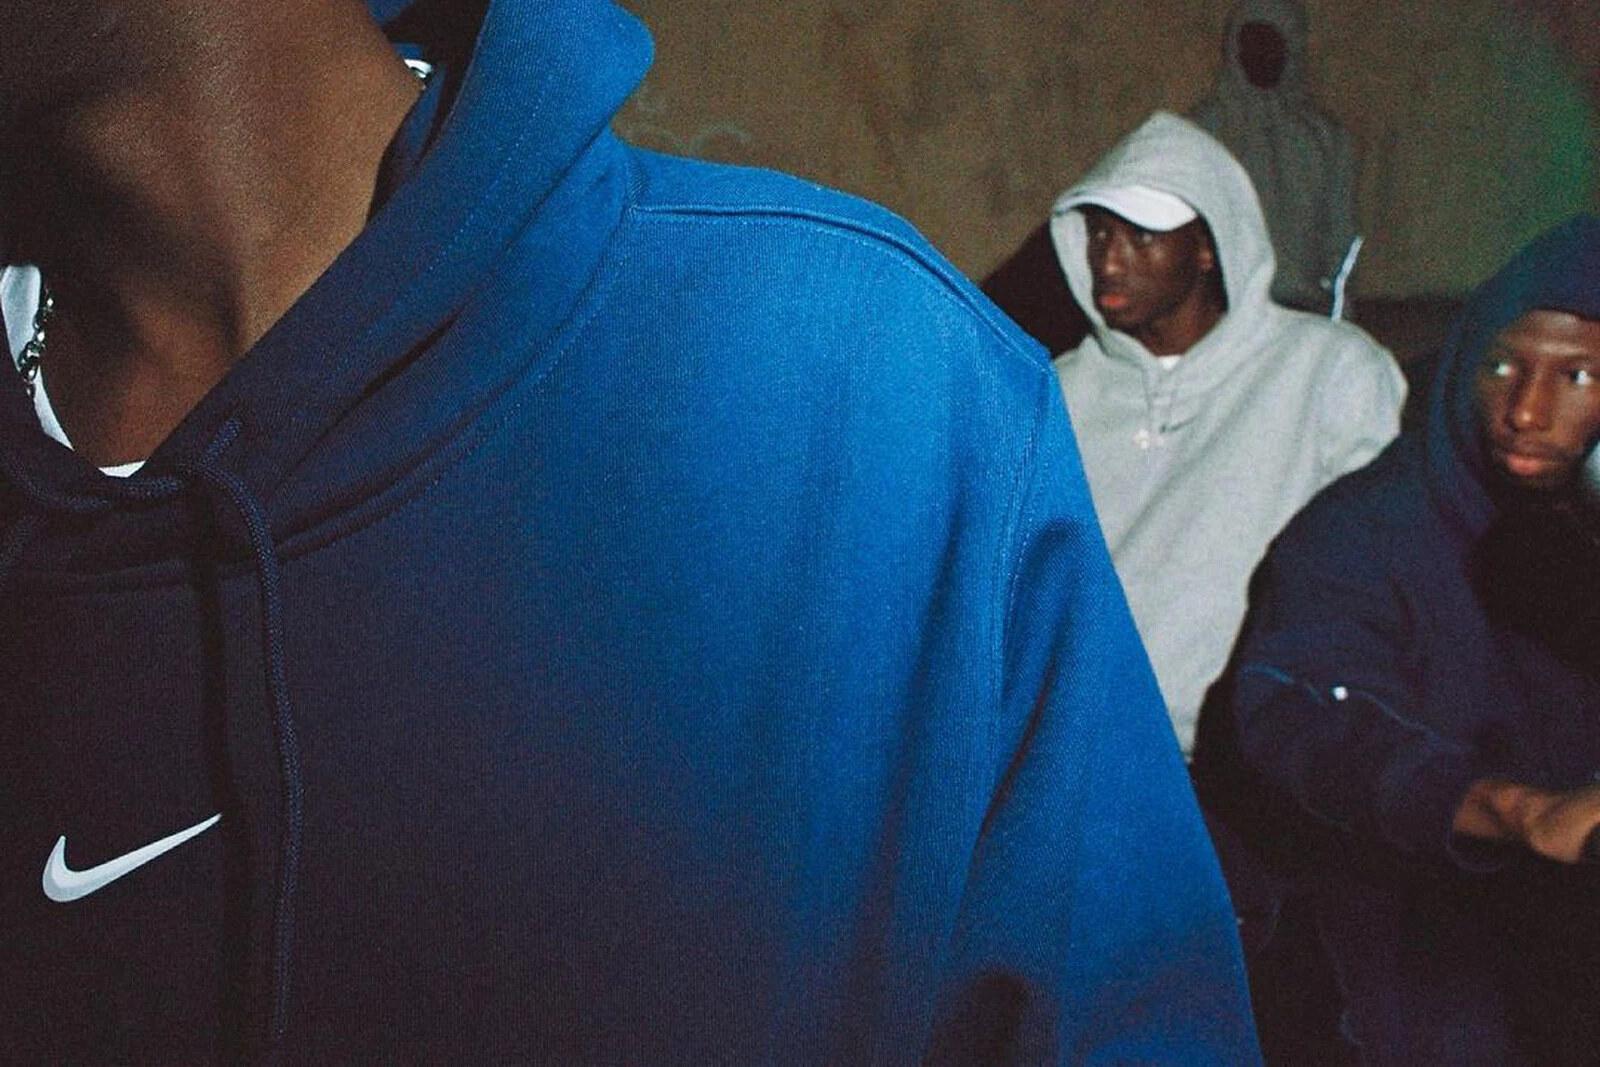 NOCTA x Drake x Nike Collezione Cardinal Stock